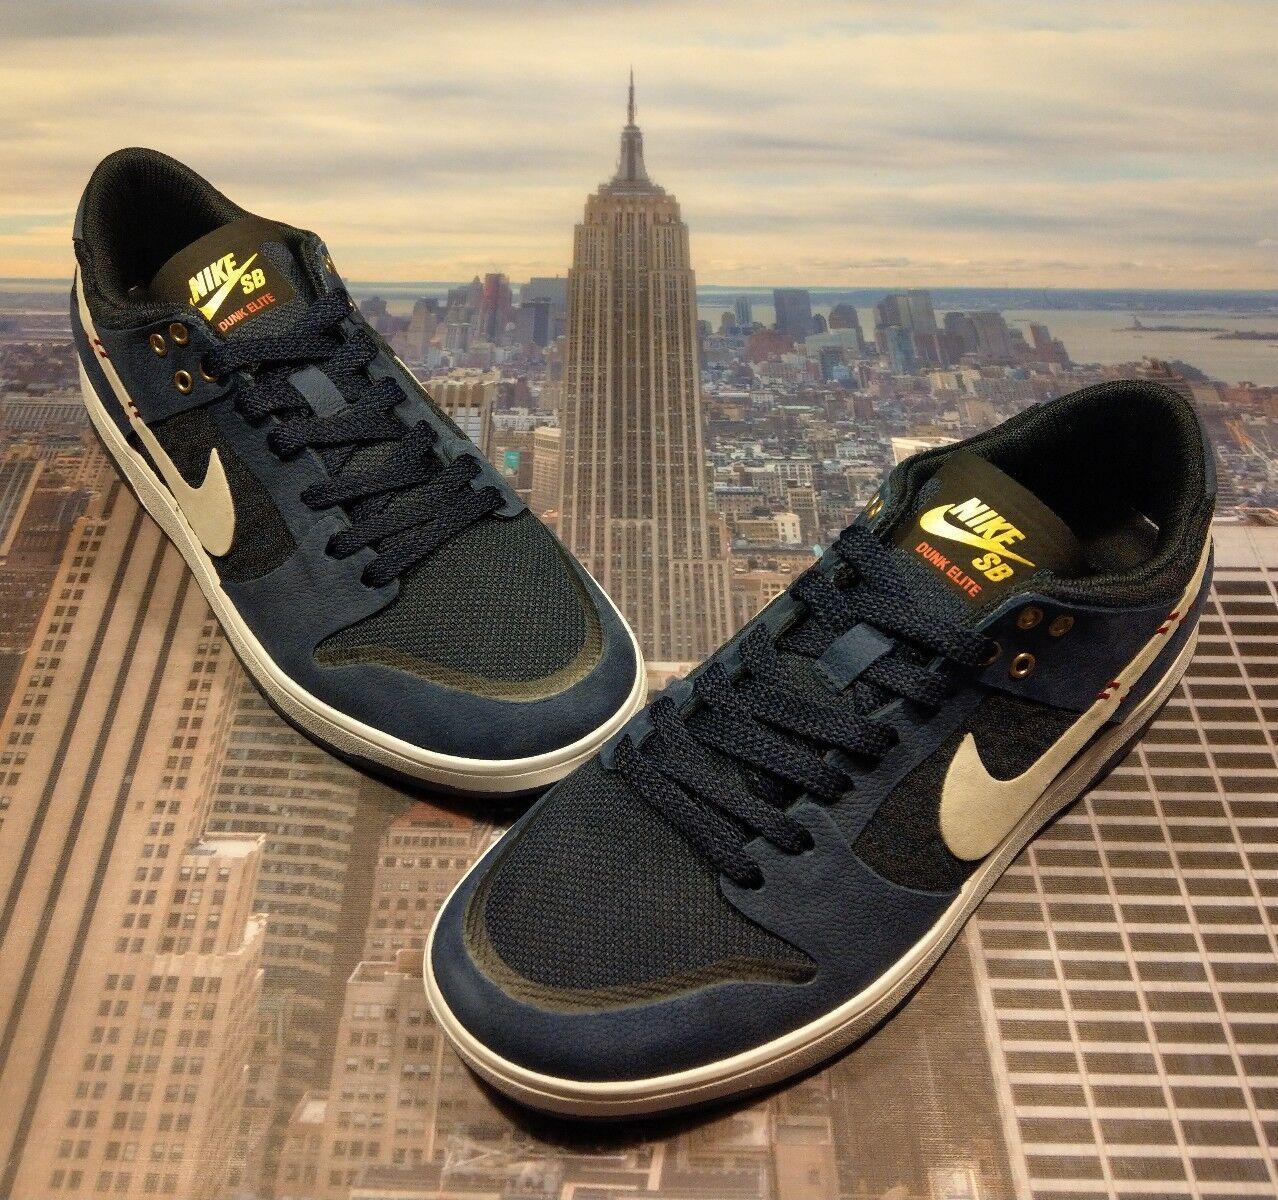 Nike sb - dunk low low dunk elite - sean malto samurai - mens größe 6 877063 416 neue a44068